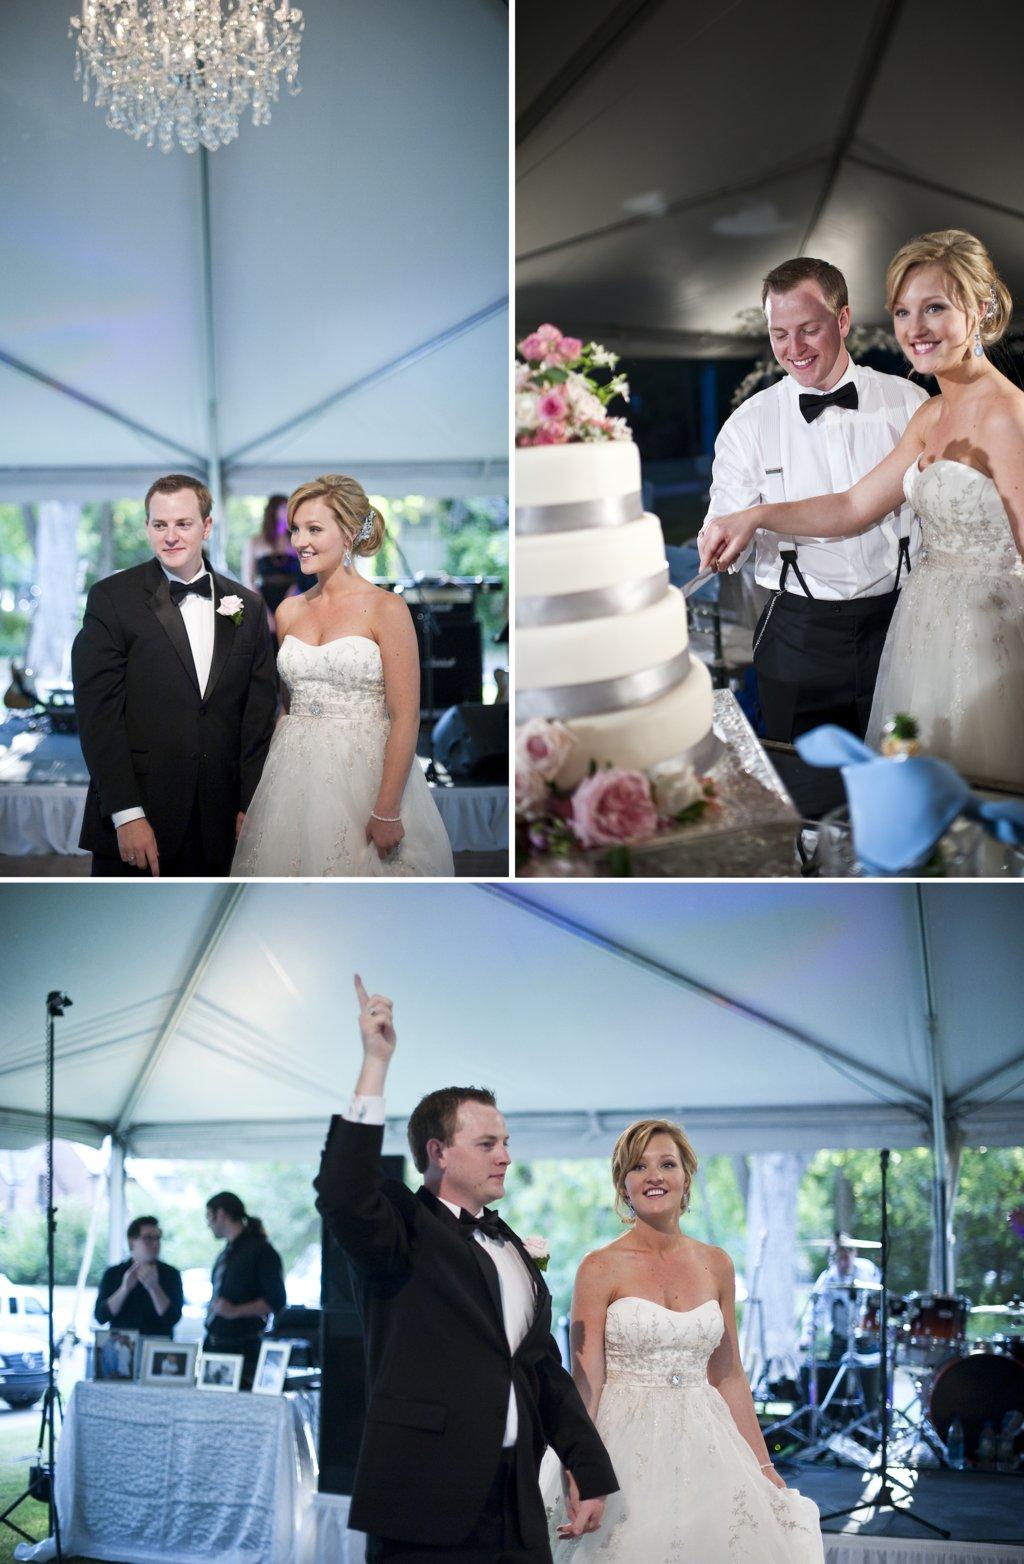 Classic-real-wedding-elegant-fall-reception-bride-groom-tent-wedding-venue.full